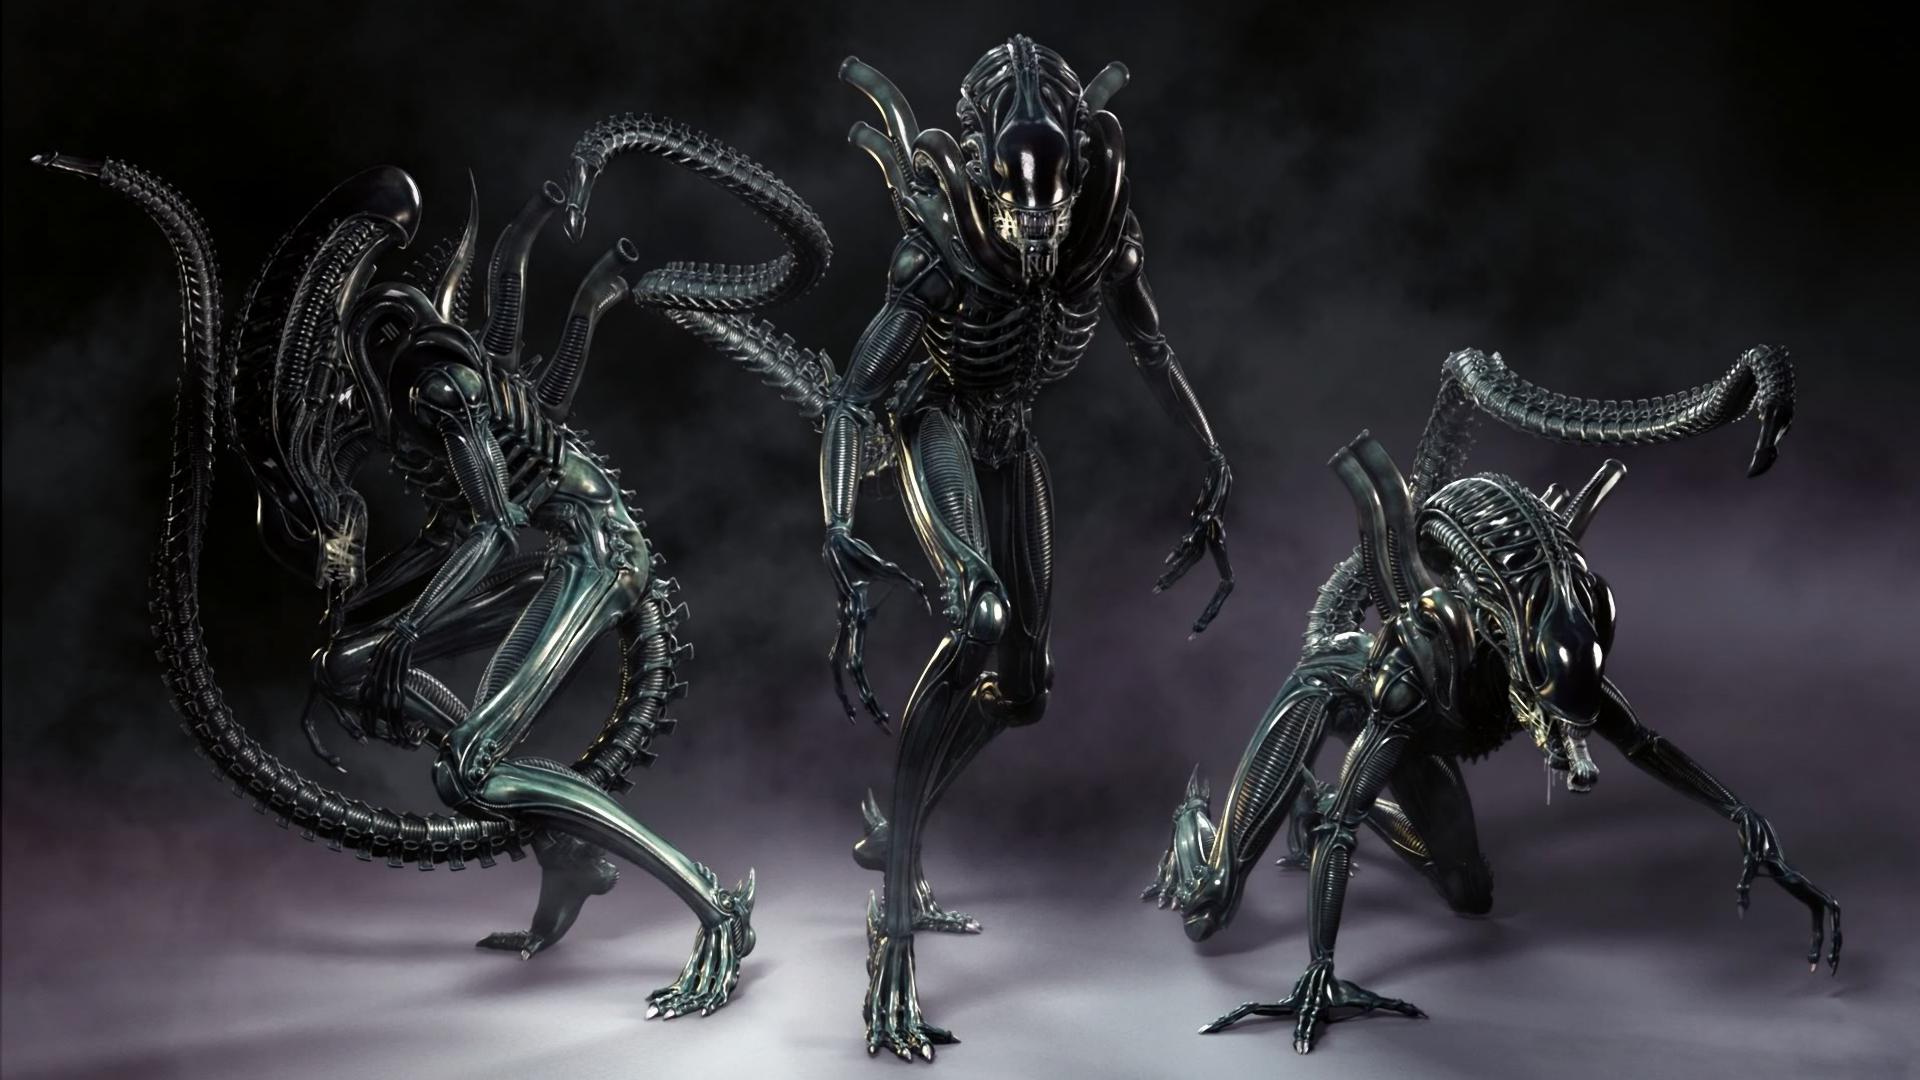 Xenomorph Queen Facehugger Xenomorph-alien-aliens-HD-